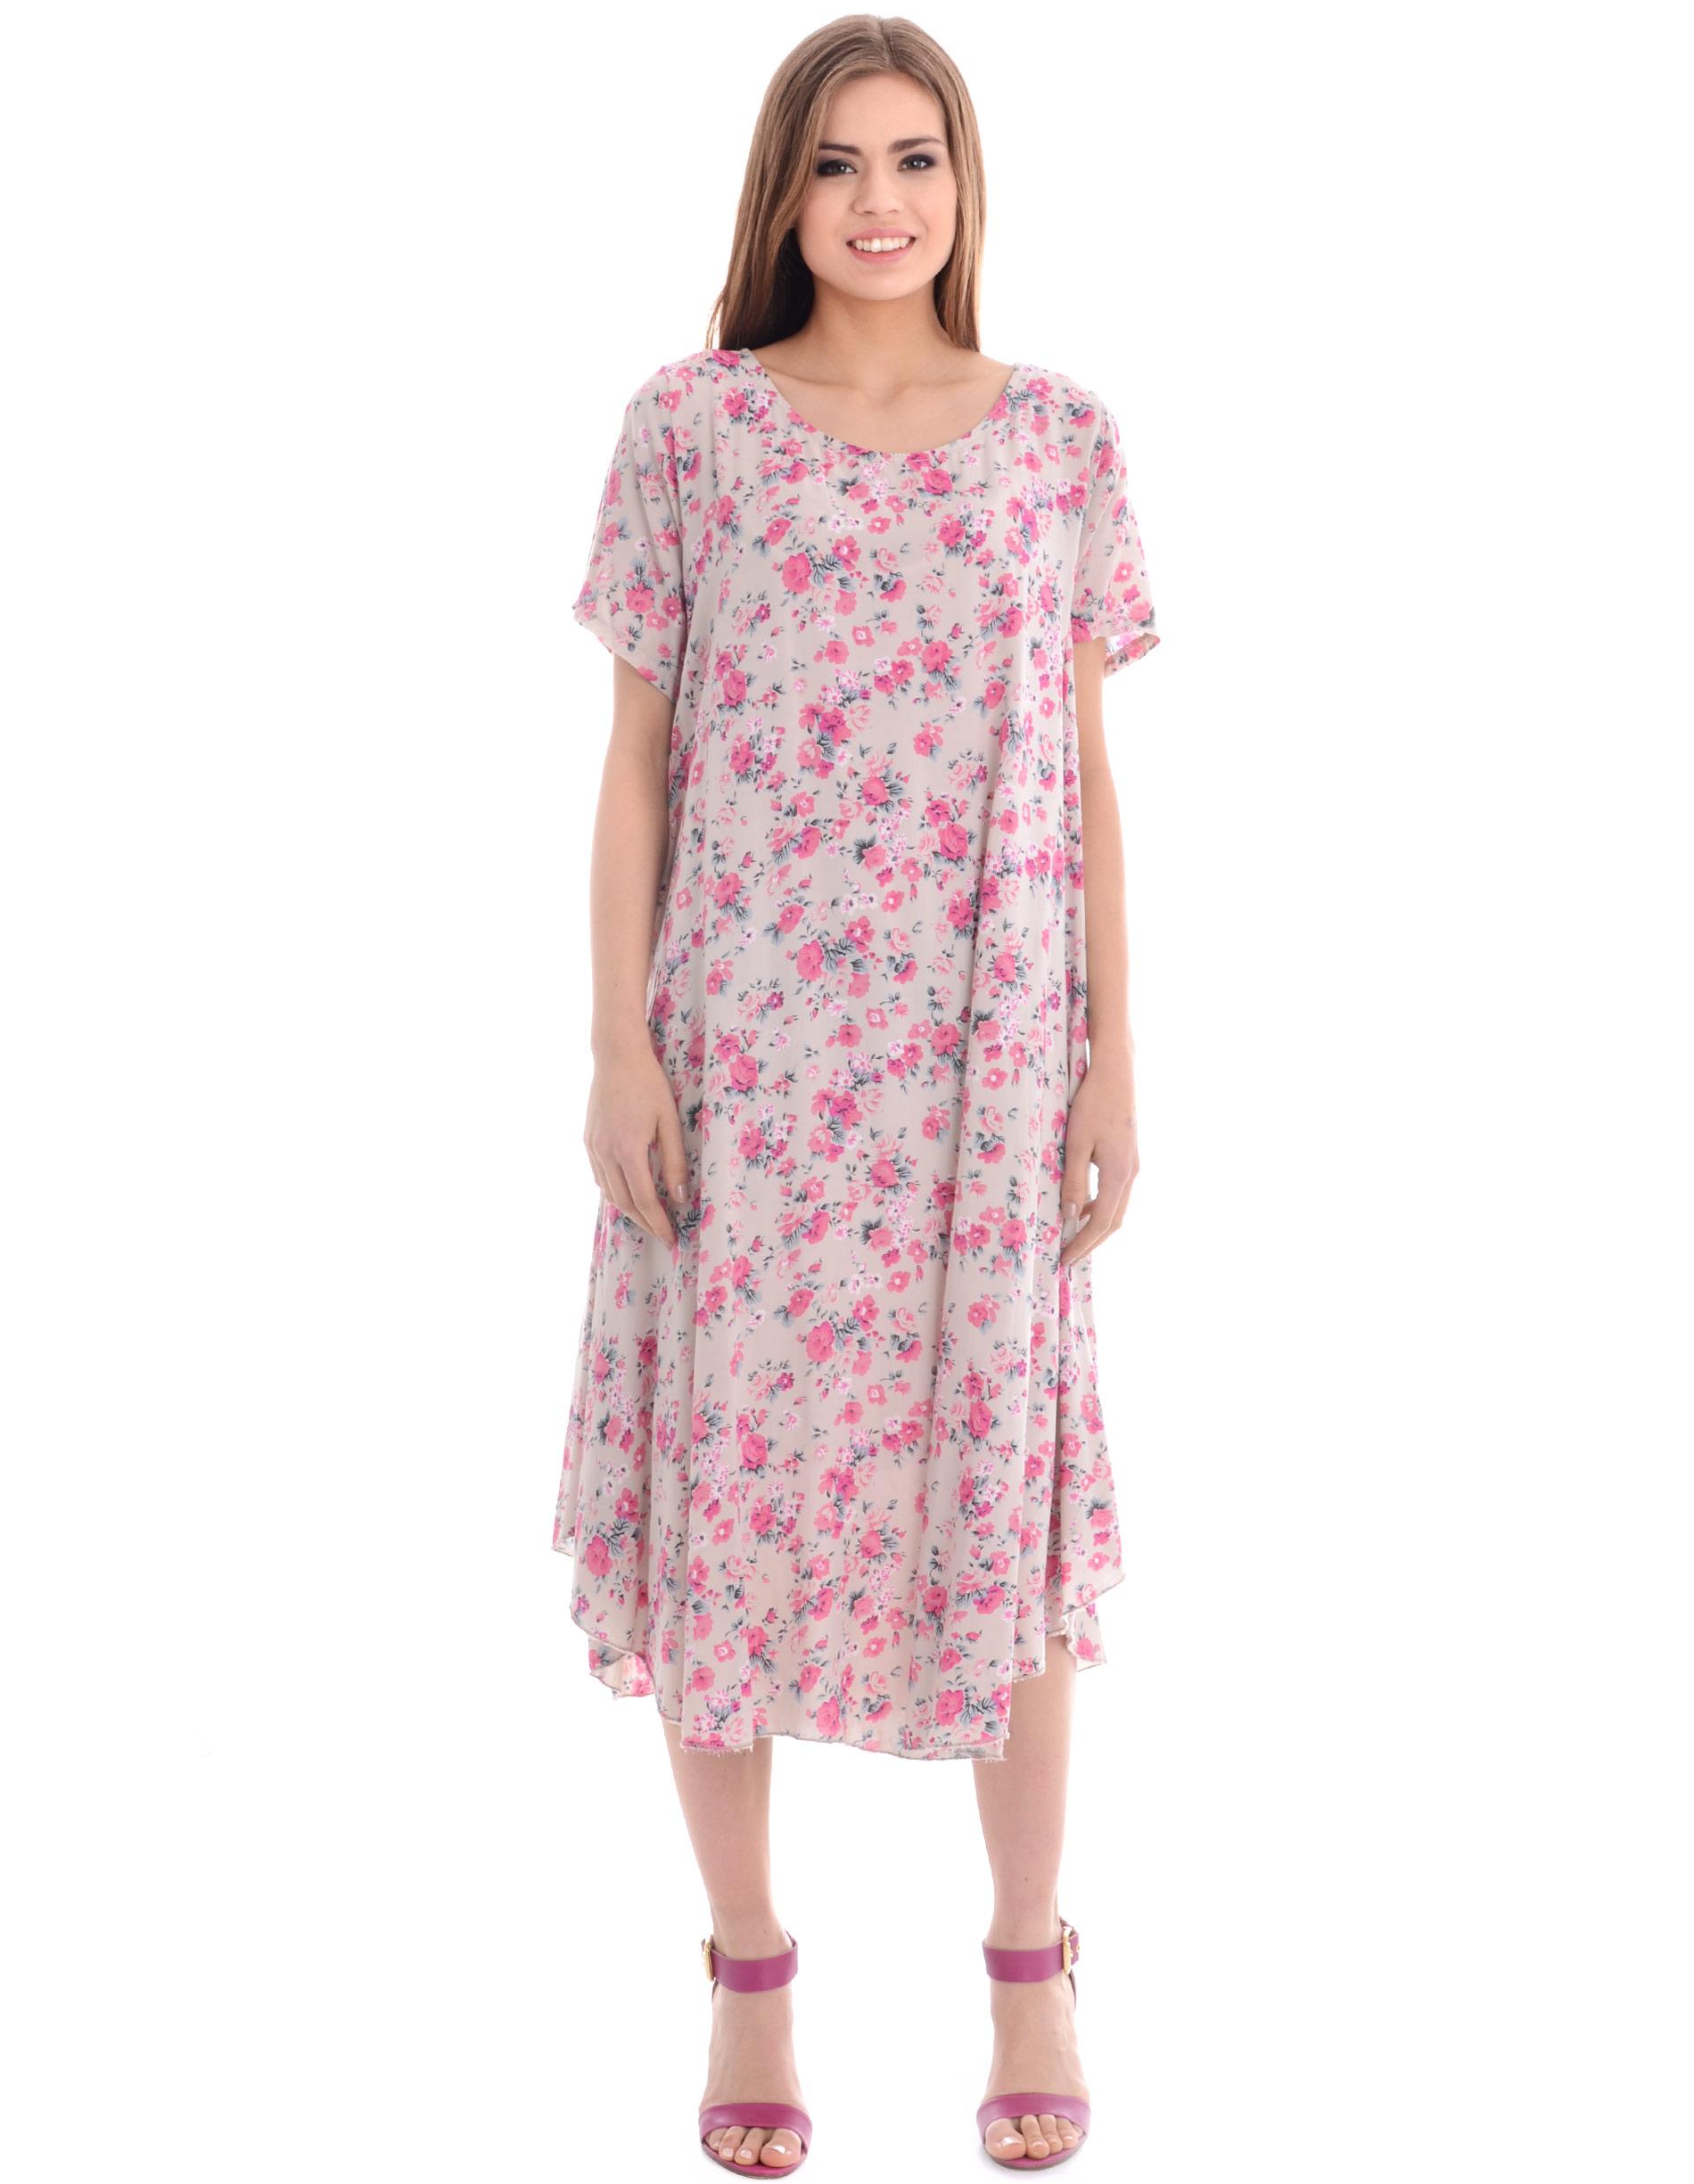 Sukienka - 75-8614 BEIGE - Unisono